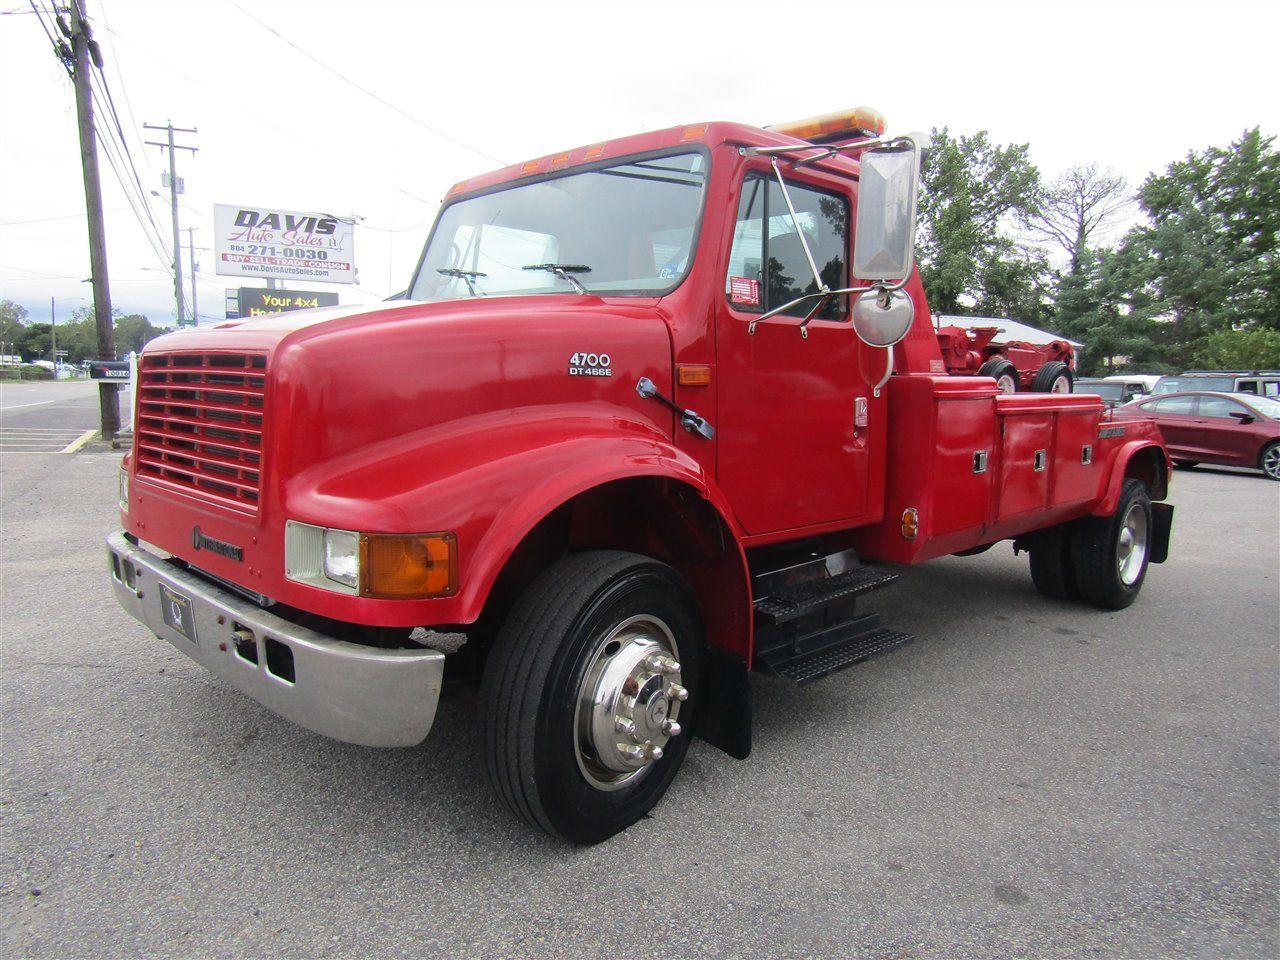 2000 International 4700 Series Medium Duty Holmes Bed Twin Line 12 Ton Wrecker Tow Truck Tow Truck Trucks Old Trucks